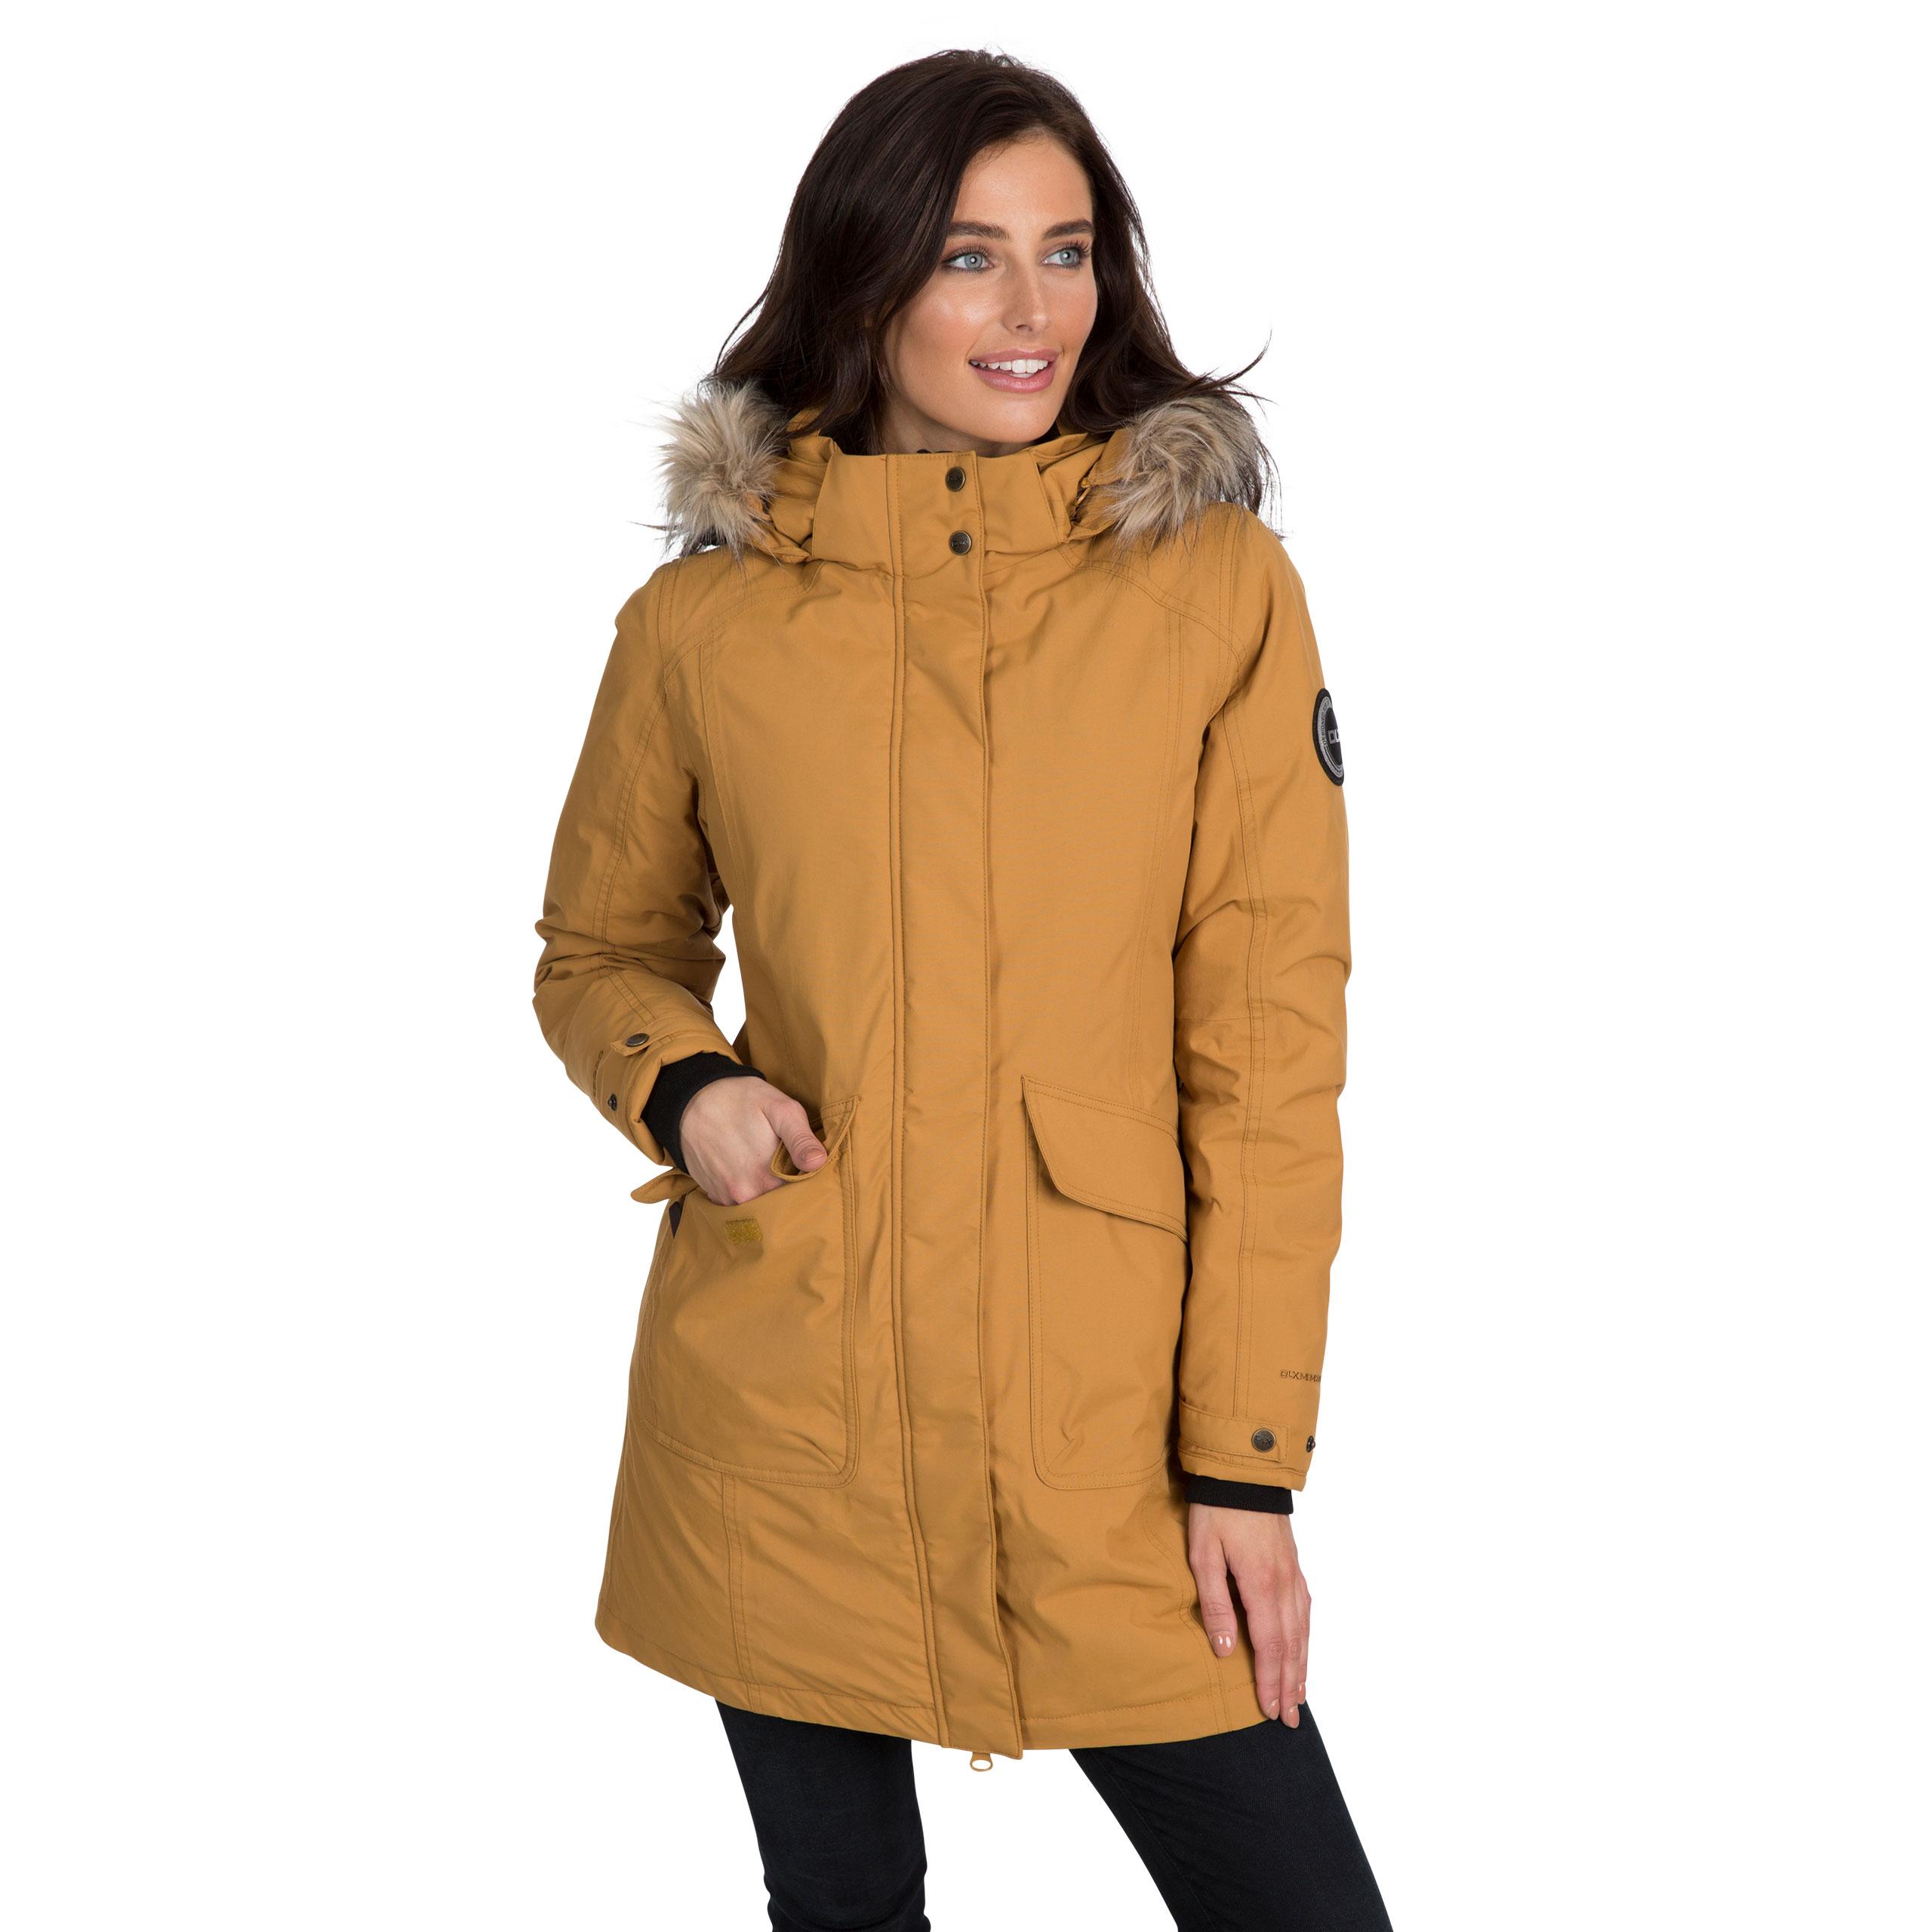 DLX Bettany Waterproof Parka Down Jacket DLX Black Yellow Green Raincoat